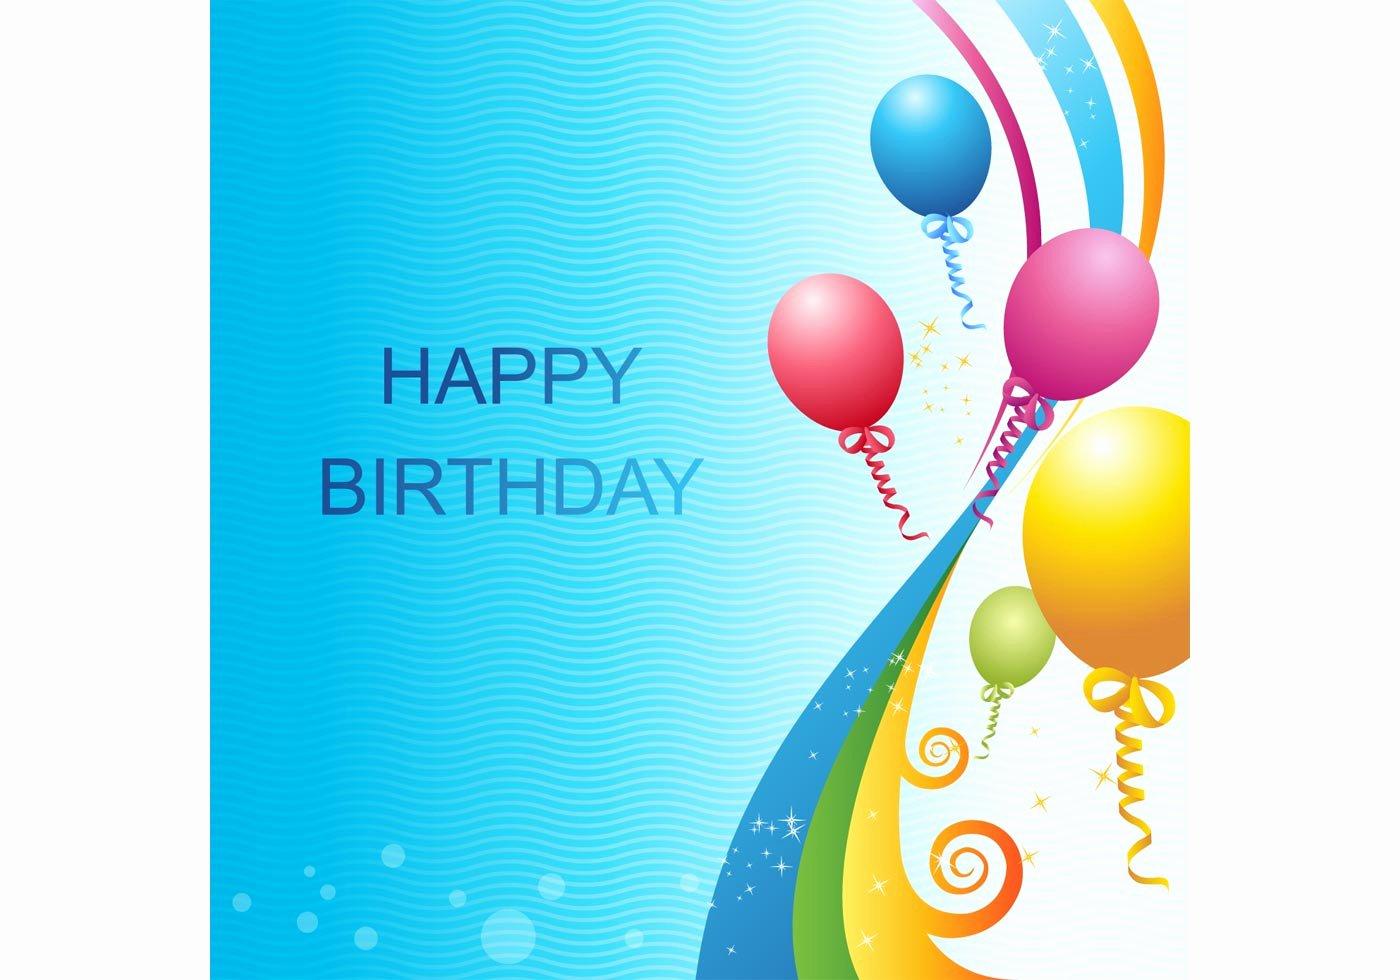 Happy Birthday Template Free Inspirational Vector Birthday Template Download Free Vector Art Stock